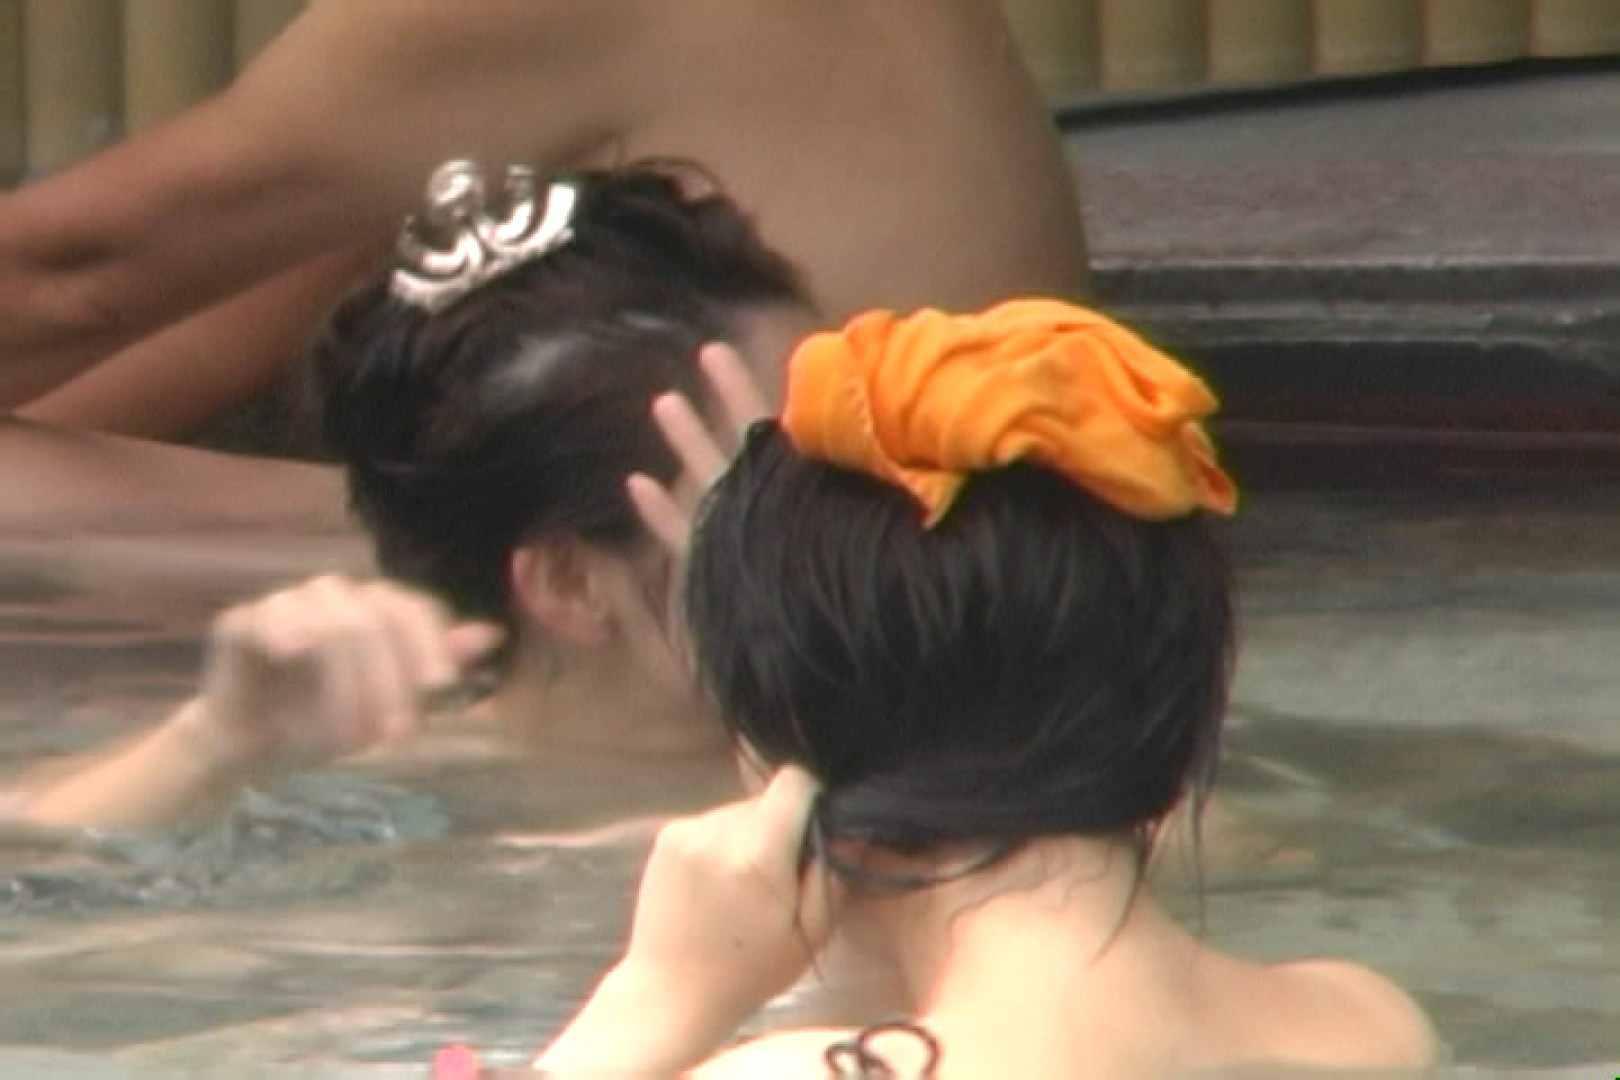 Aquaな露天風呂Vol.40【VIP】 盗撮 | OLセックス  66画像 10